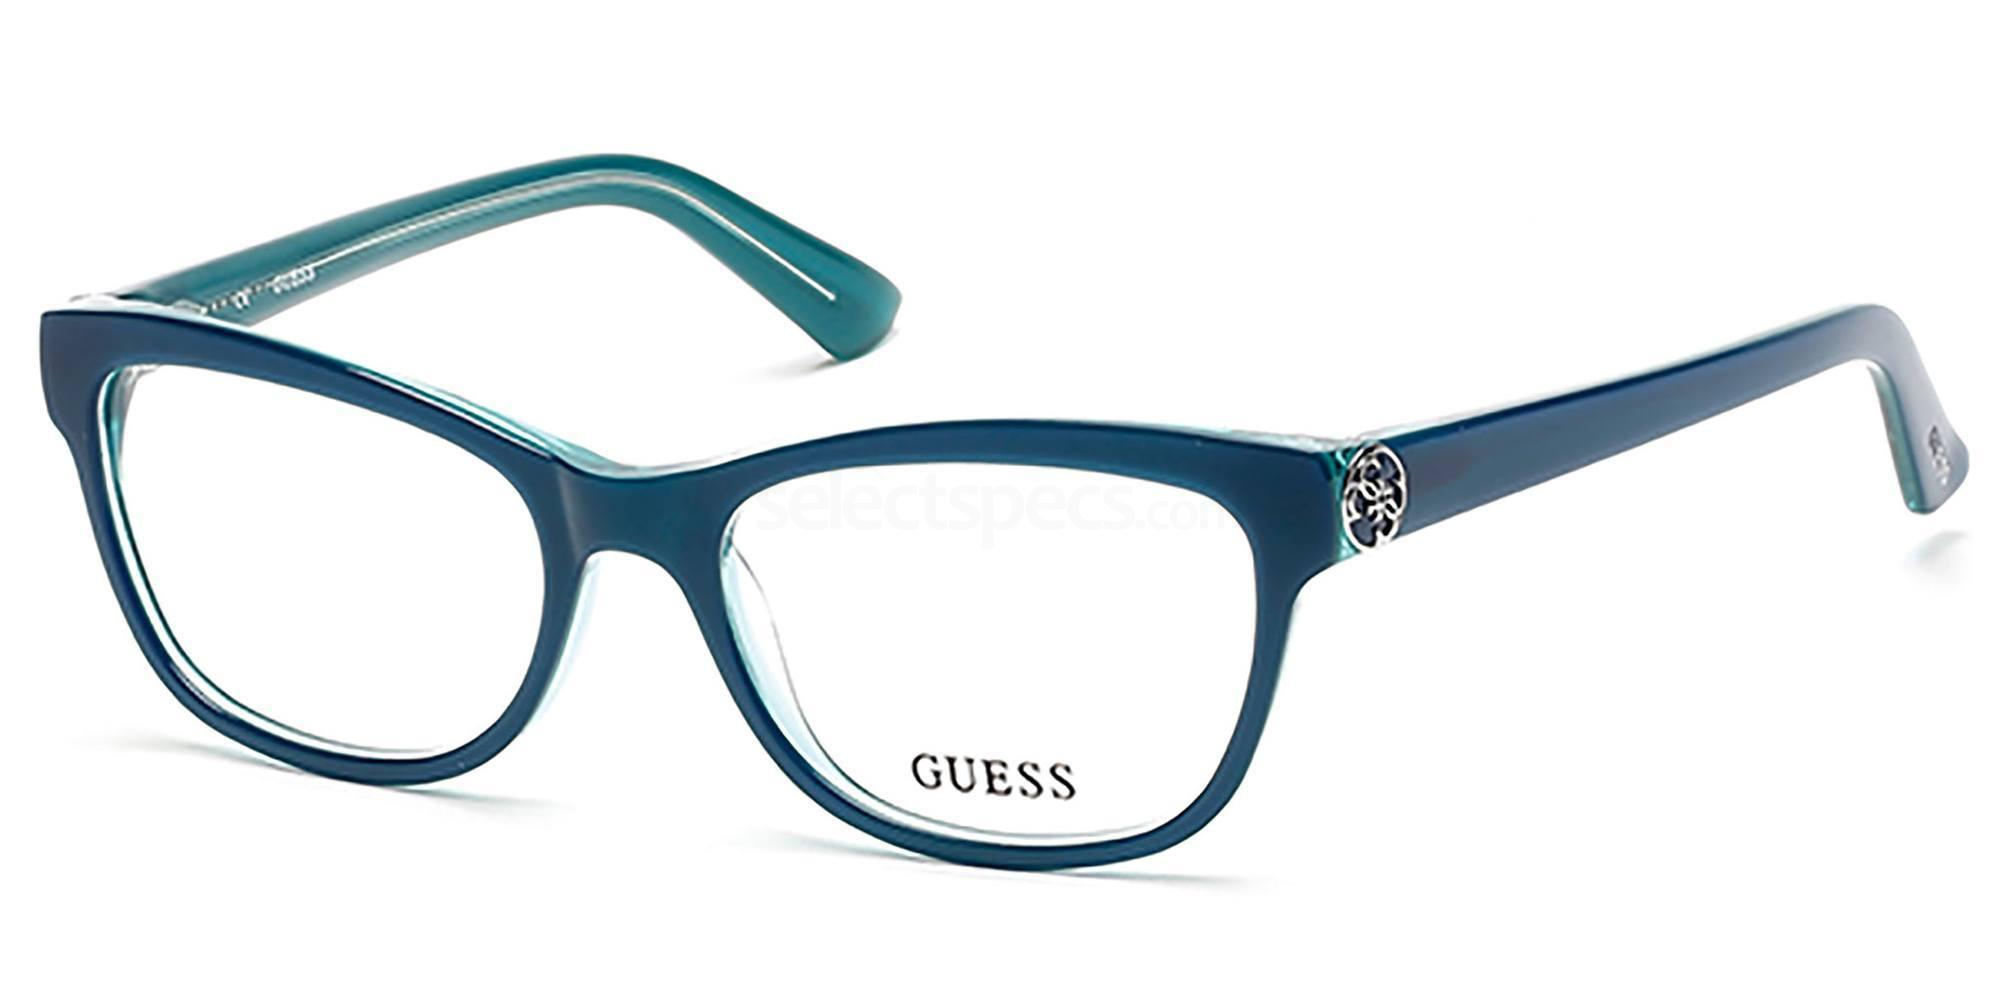 087 GU2527 Glasses, Guess